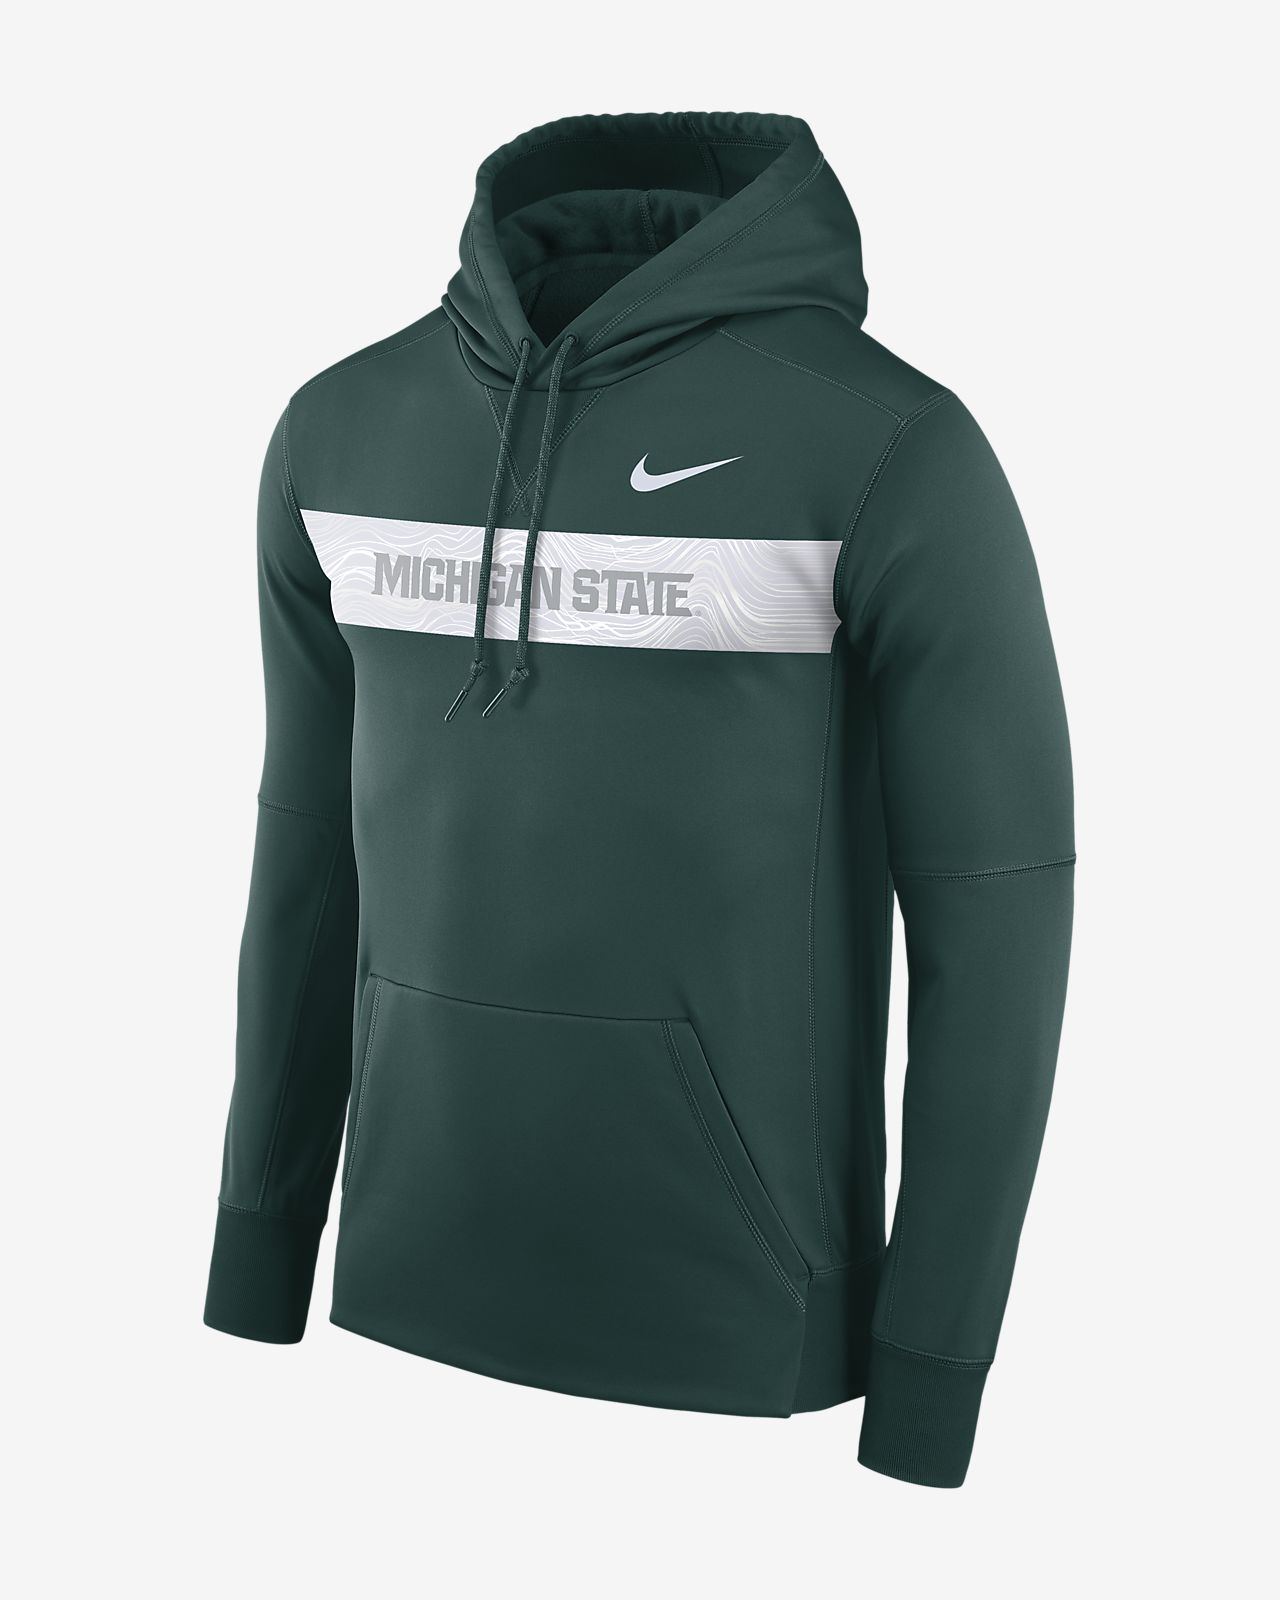 Nike College Dri Fit Therma Michigan State Men S Pullover Hoodie